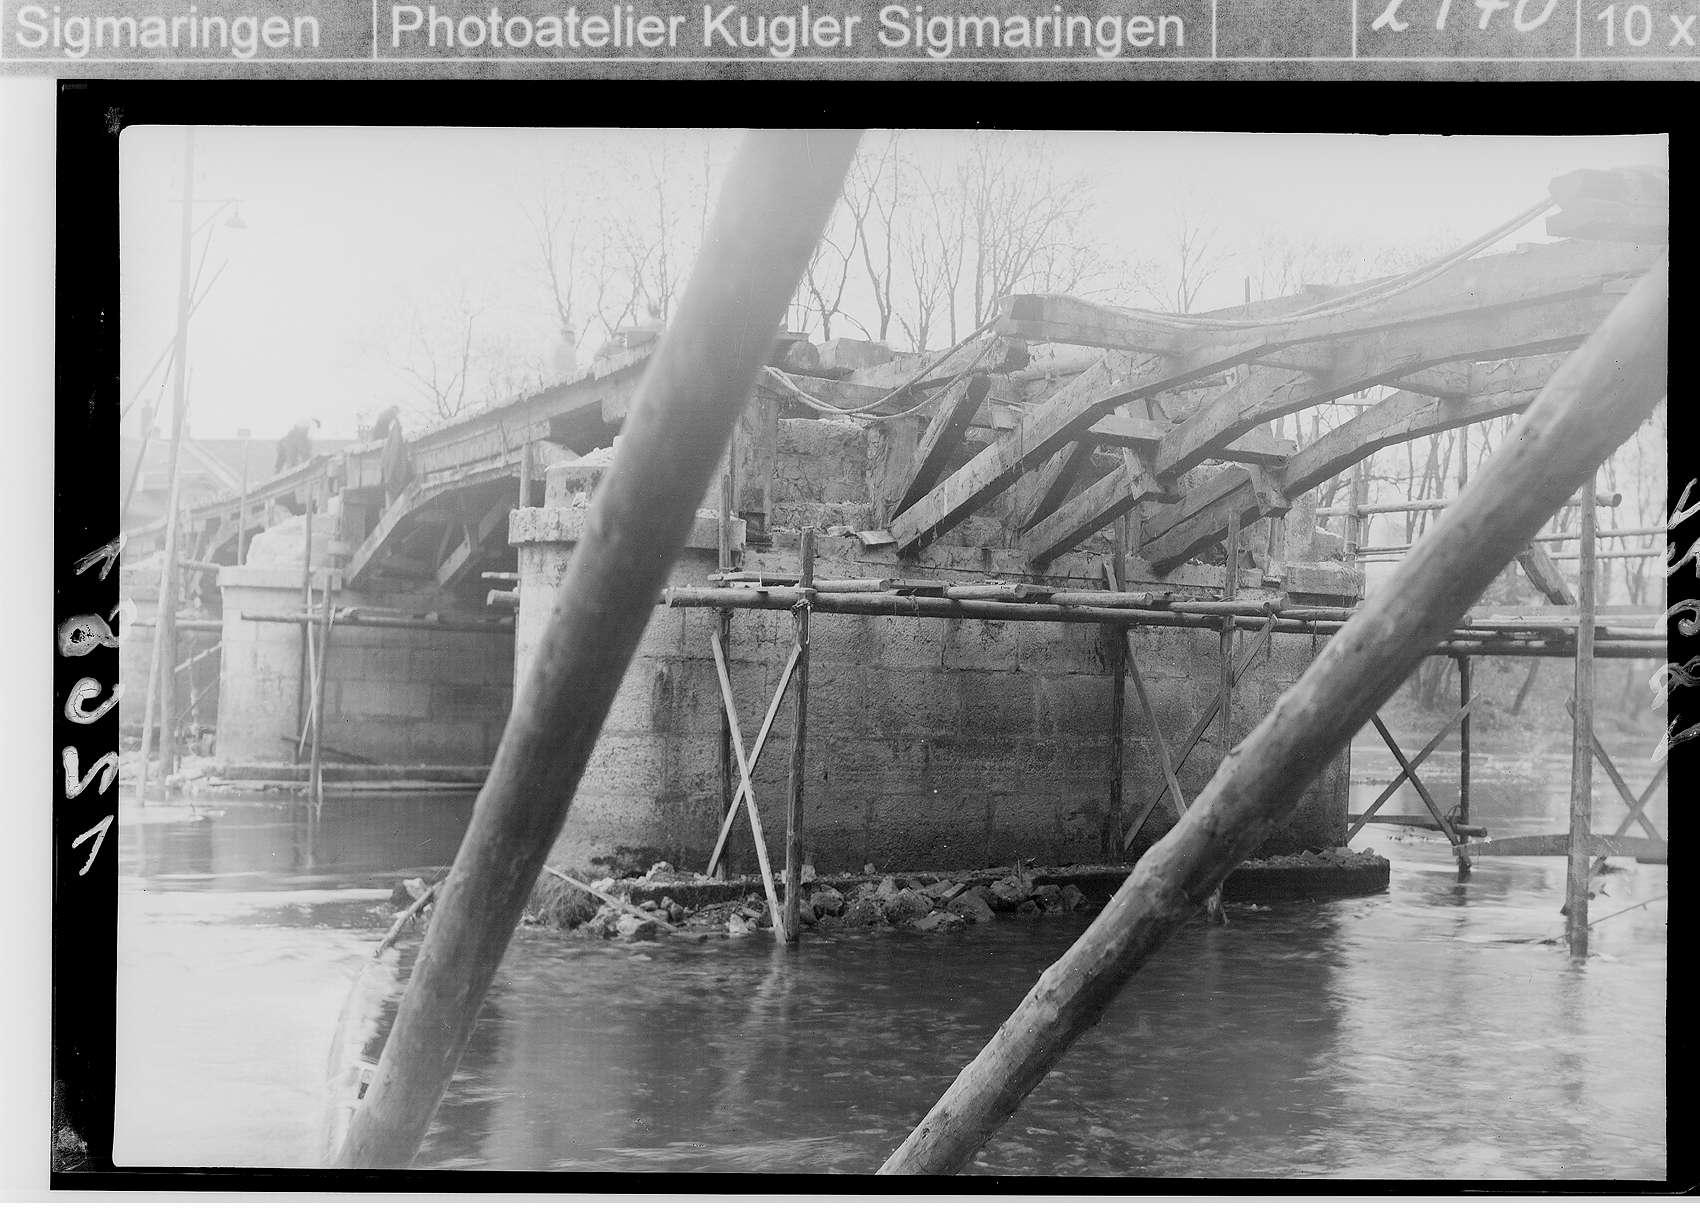 Landesbauamt Sigmaringen - Umbau der Nepomukbrücke (Bauhofbrücke); Brückenunterseite, Bild 1